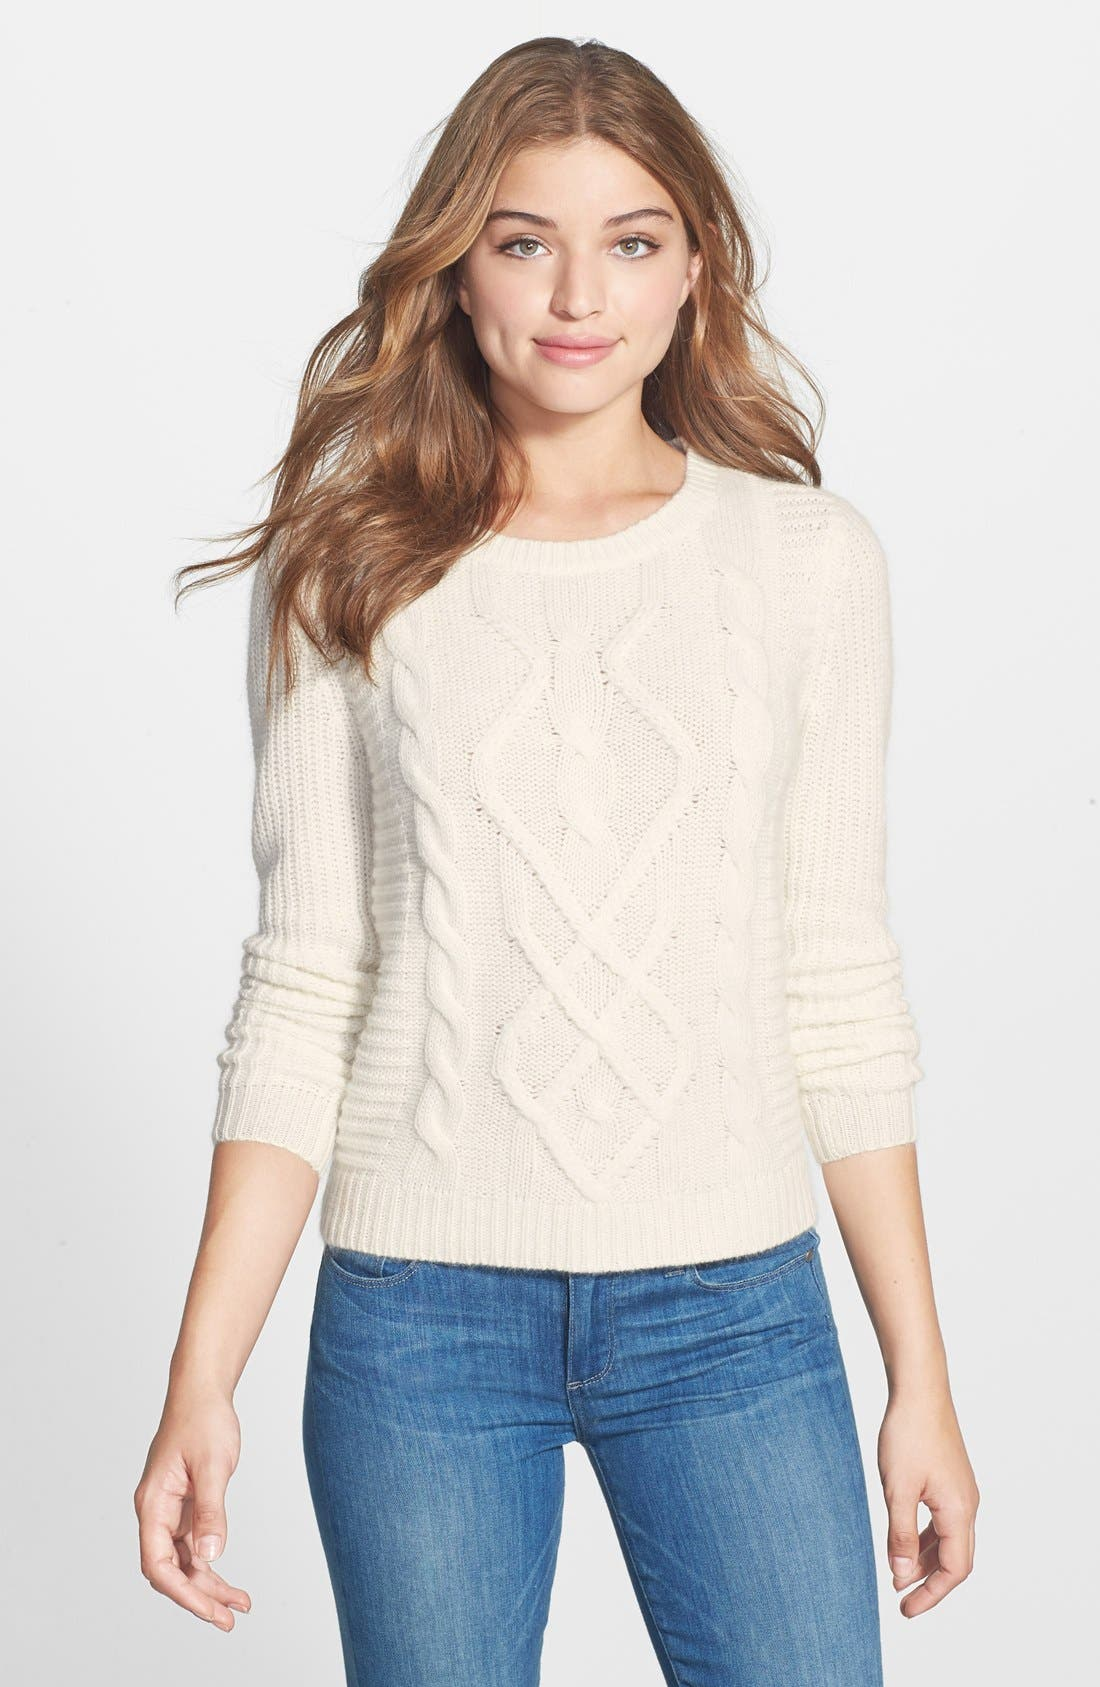 Alternate Image 1 Selected - Caslon® Cable Knit Sweater (Regular & Petite)